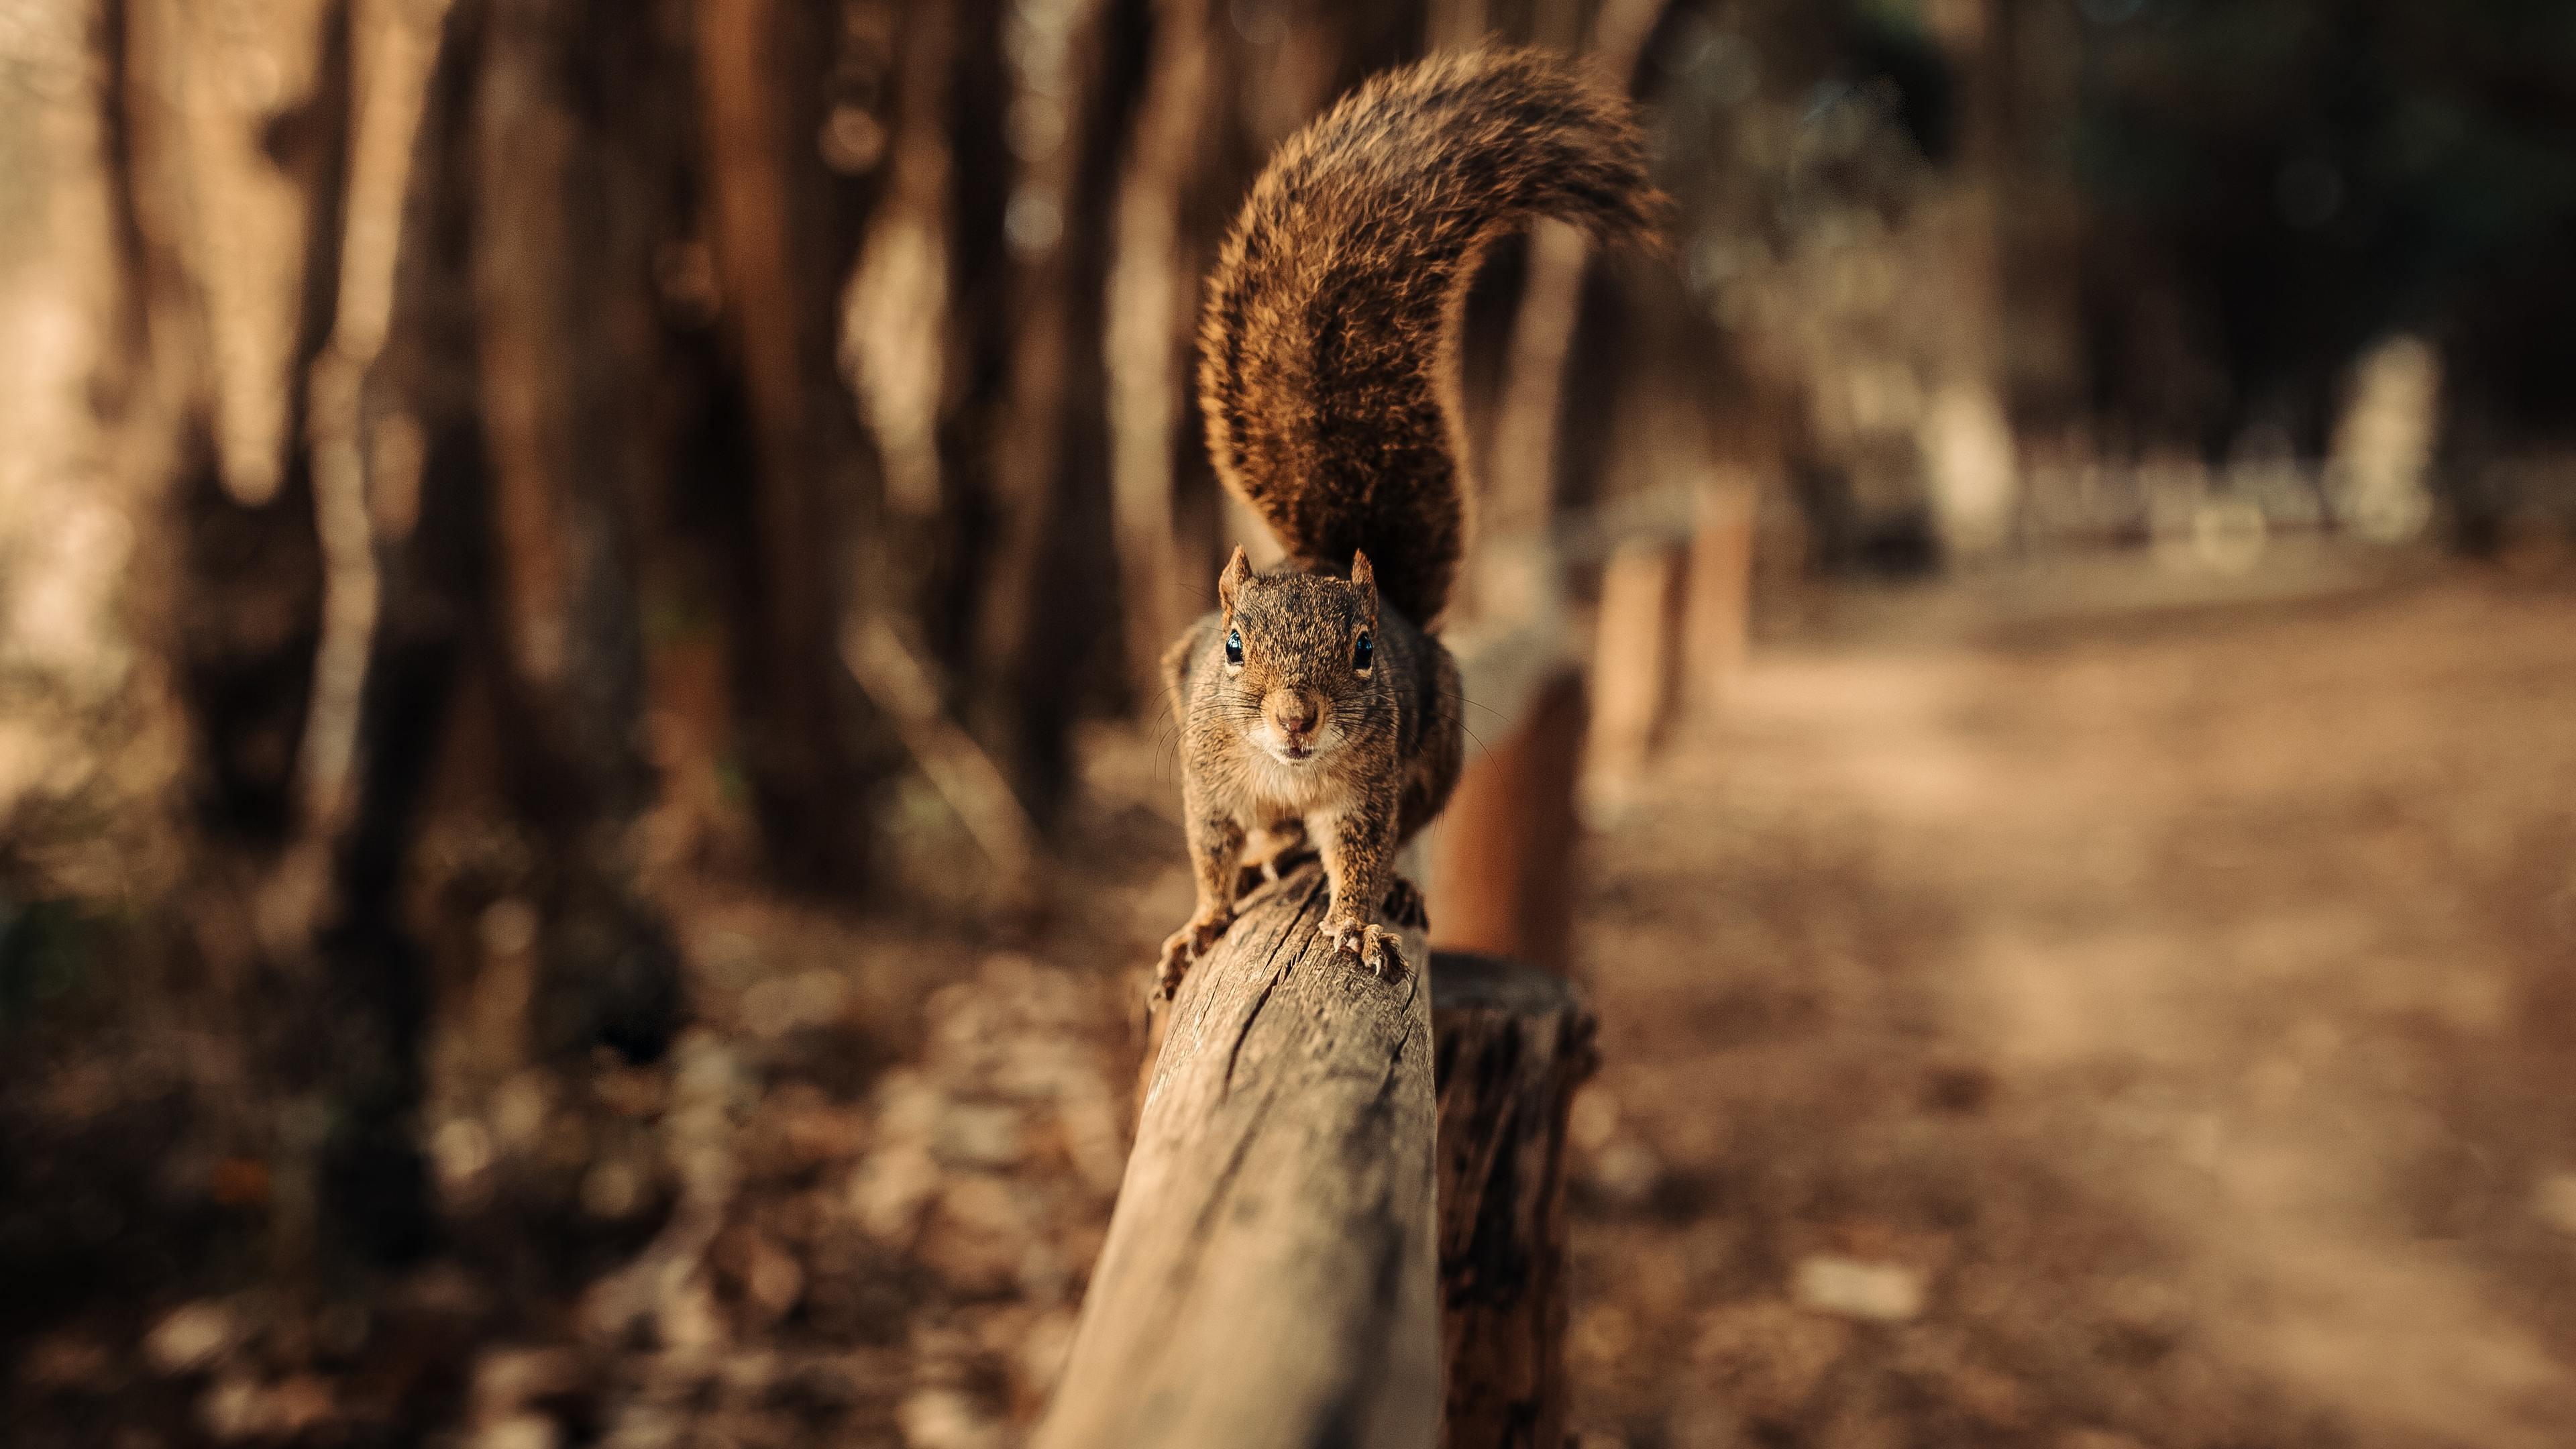 squirrel walking on fence 4k 1542239621 - Squirrel Walking On Fence 4k - squirrel wallpapers, snow wallpapers, macro wallpapers, hd-wallpapers, fence wallpapers, animals wallpapers, 4k-wallpapers